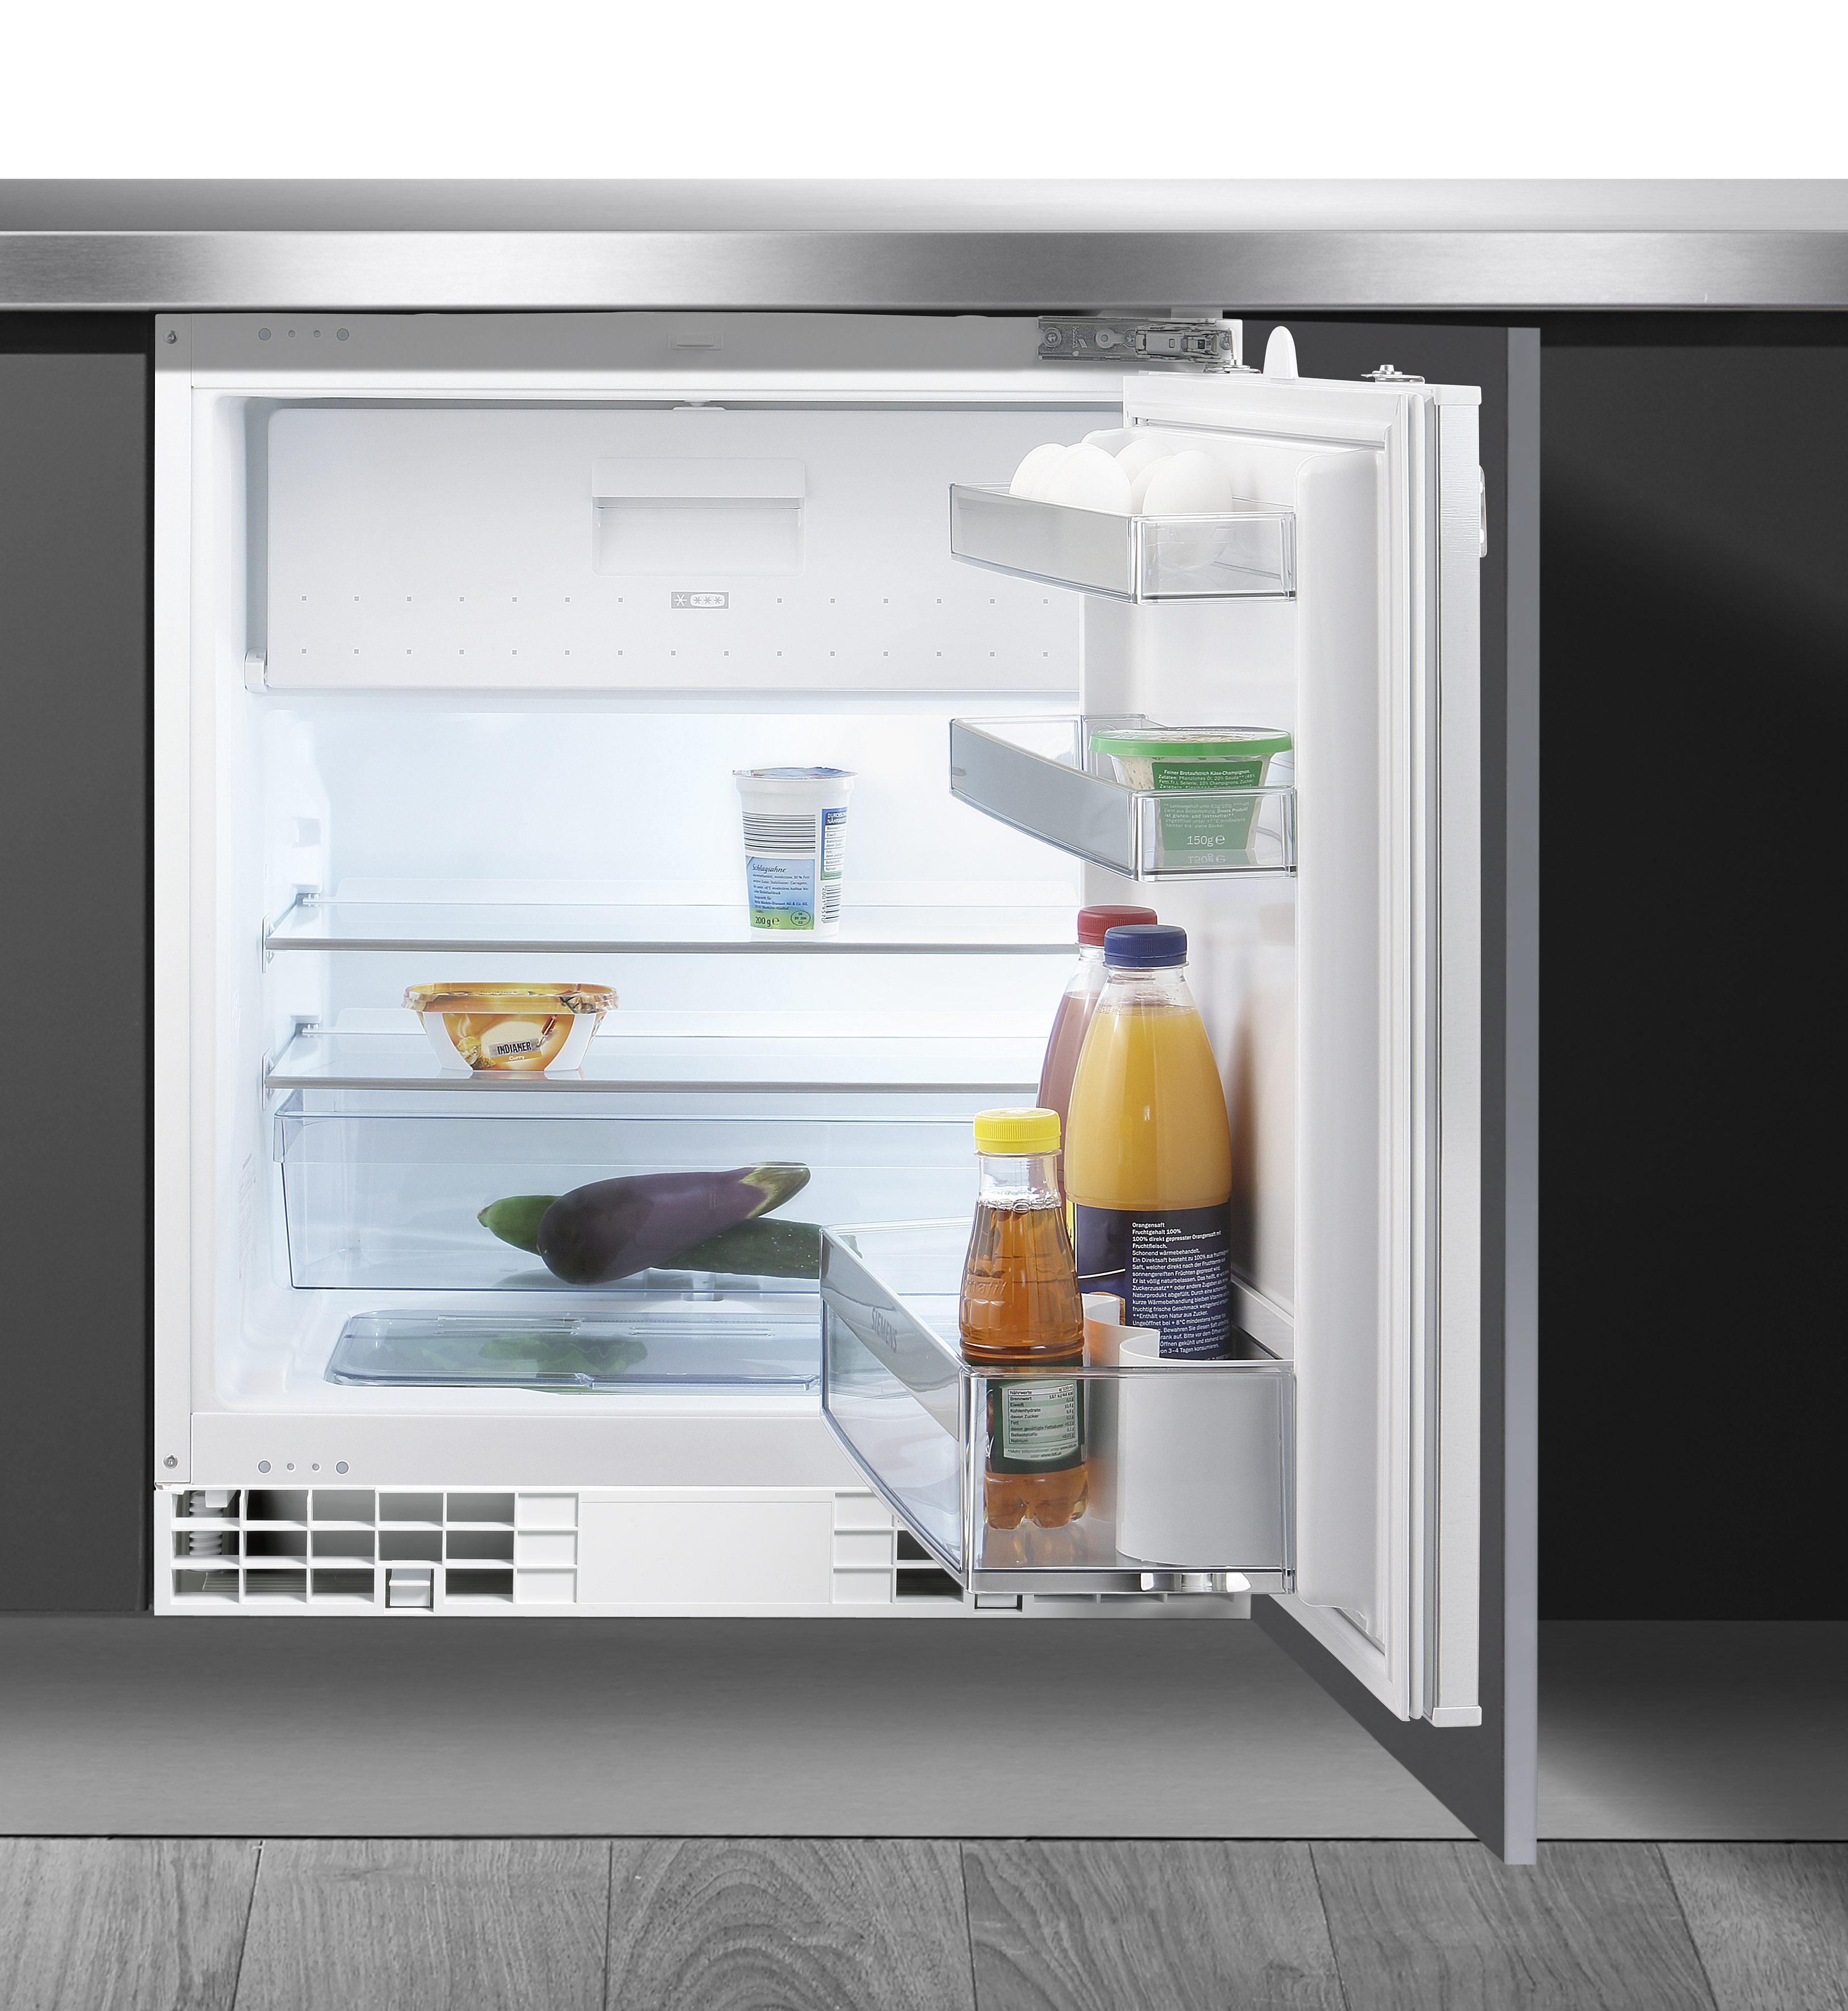 Siemens Integrierbarer Unterbau-Kühlschrank KU15LA60, A++, 82 cm